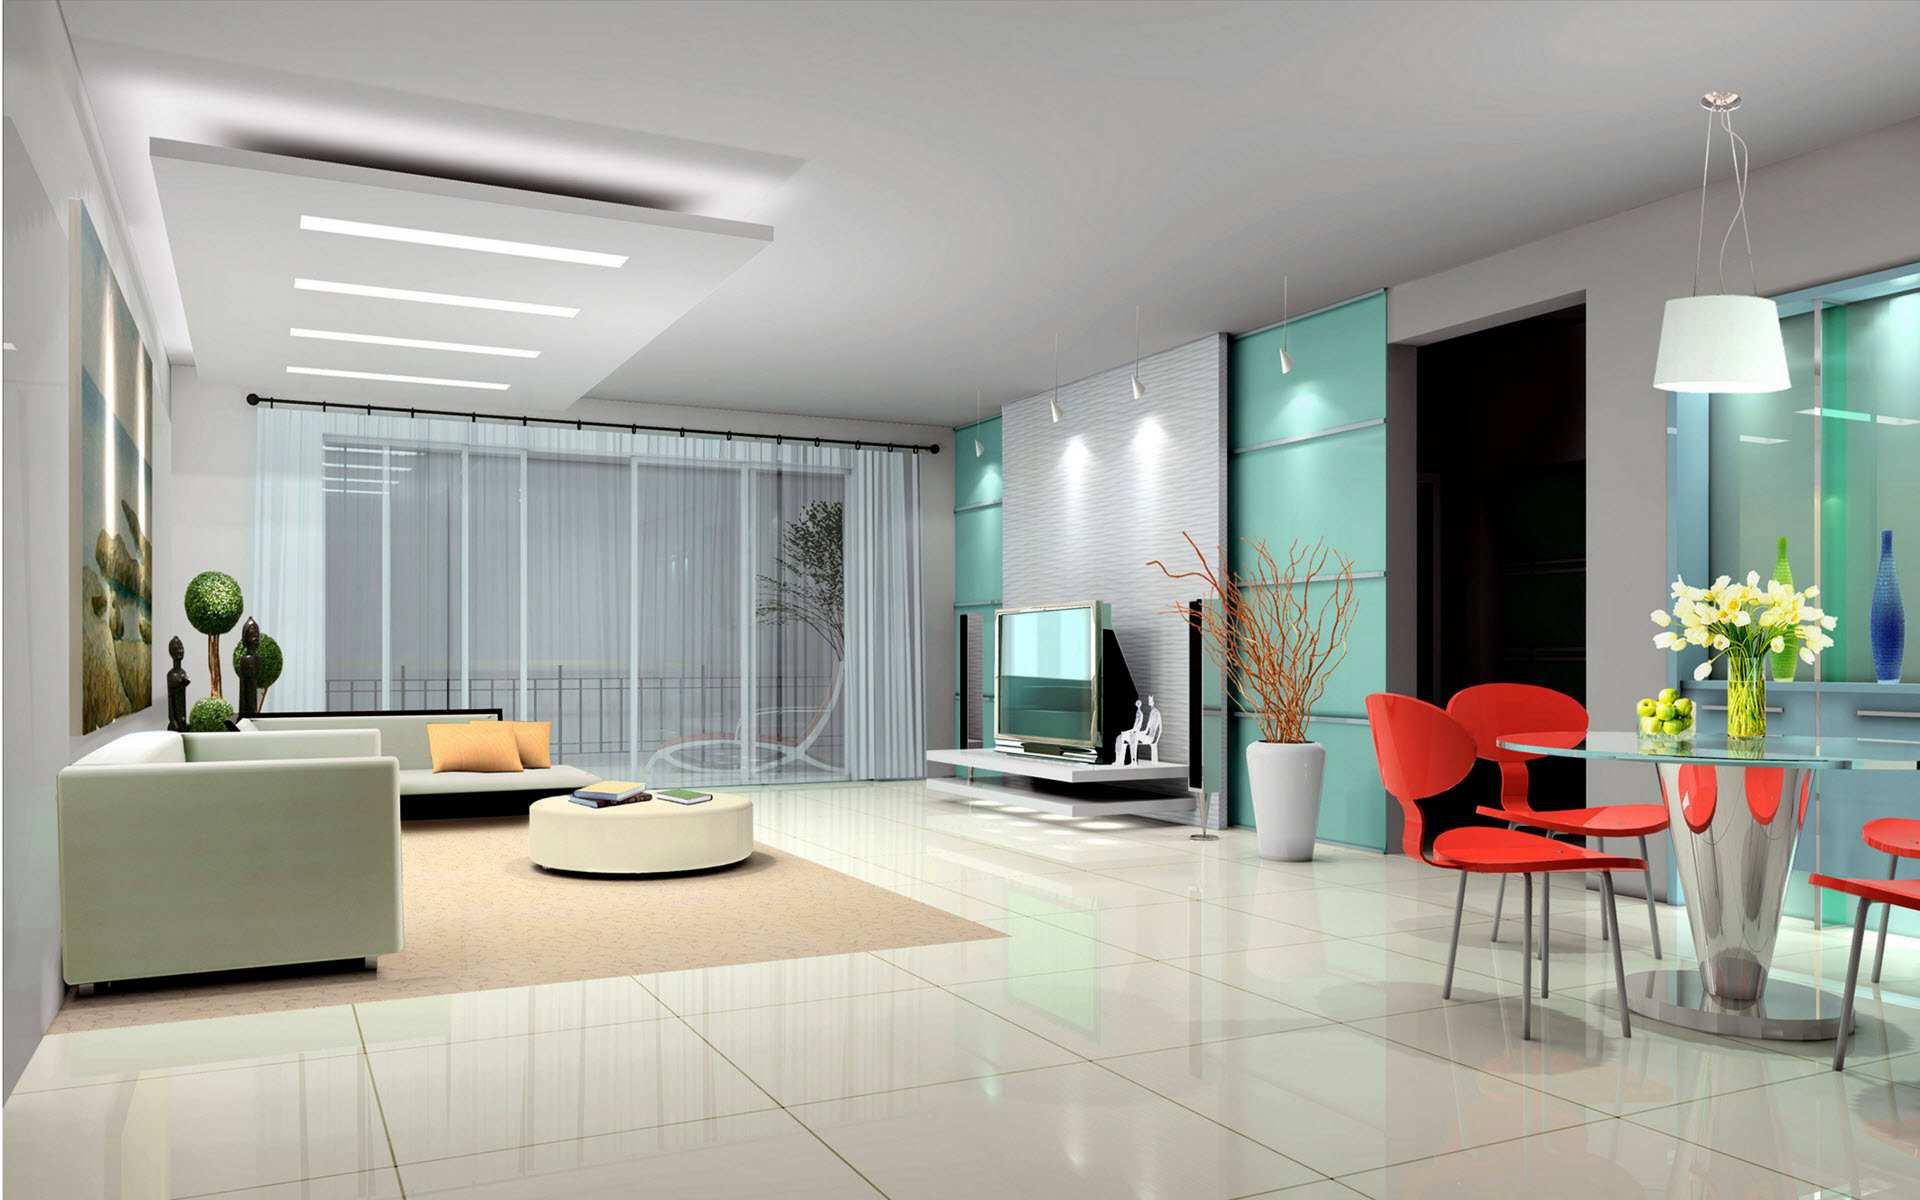 A Postmodern interior